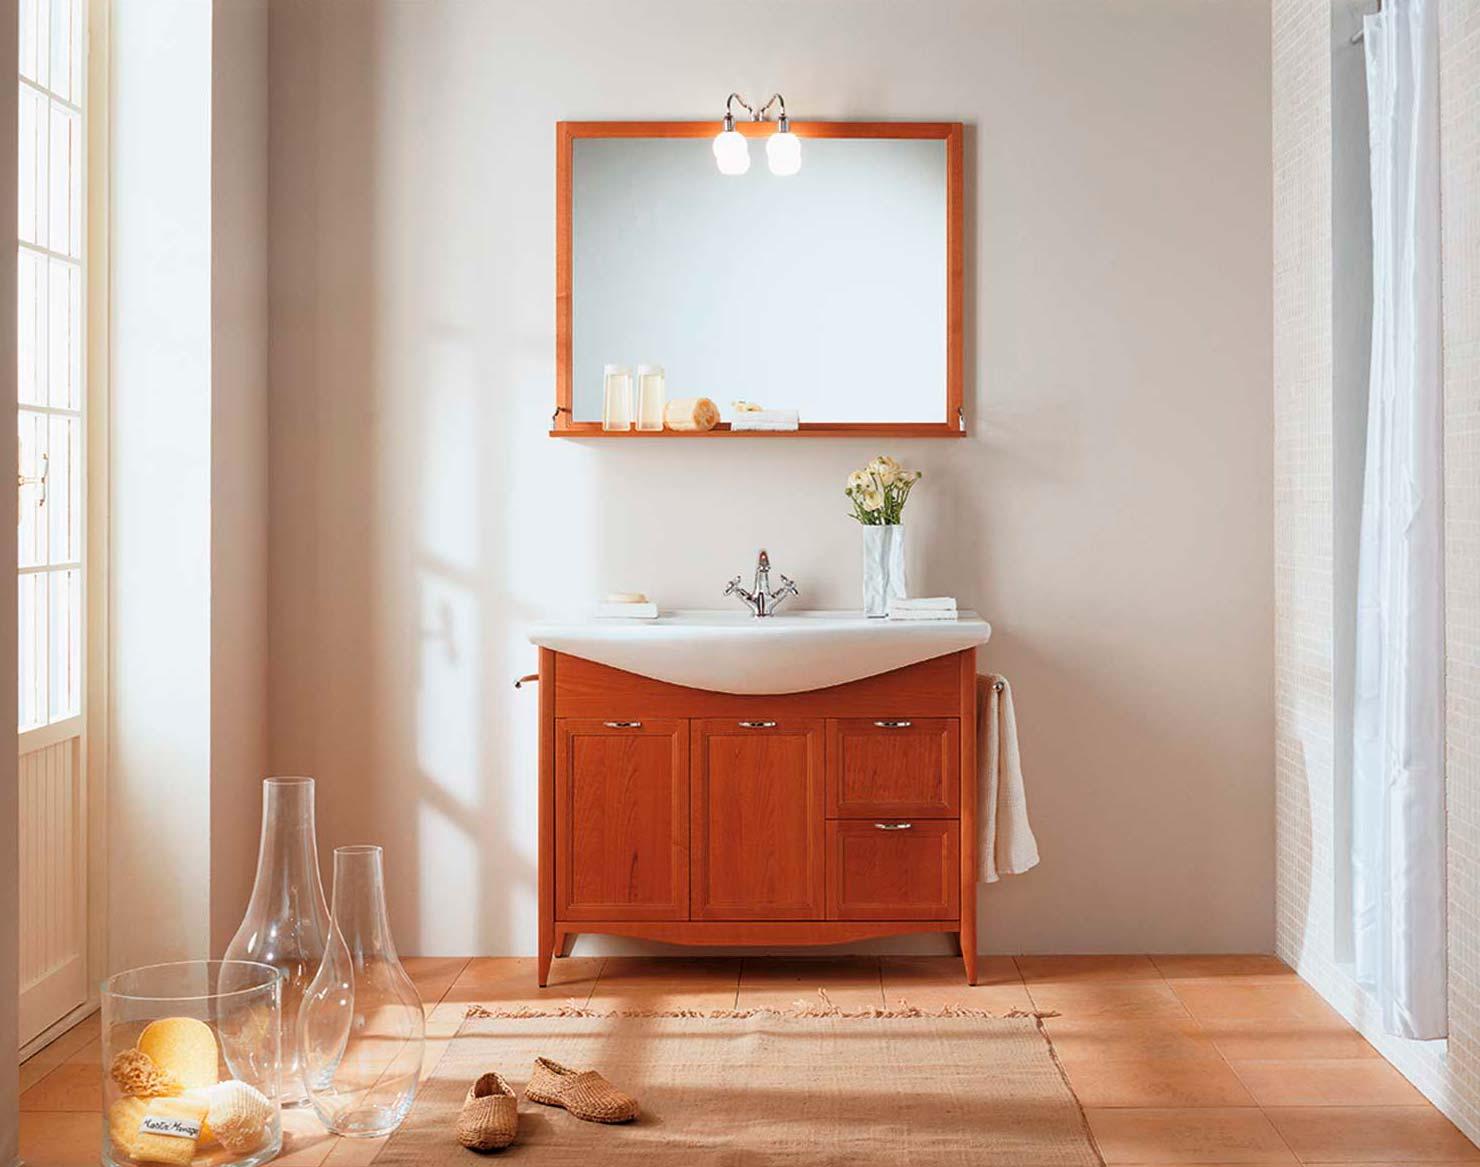 Berloni bagno mobili da bagno edilceramiche di maccanò